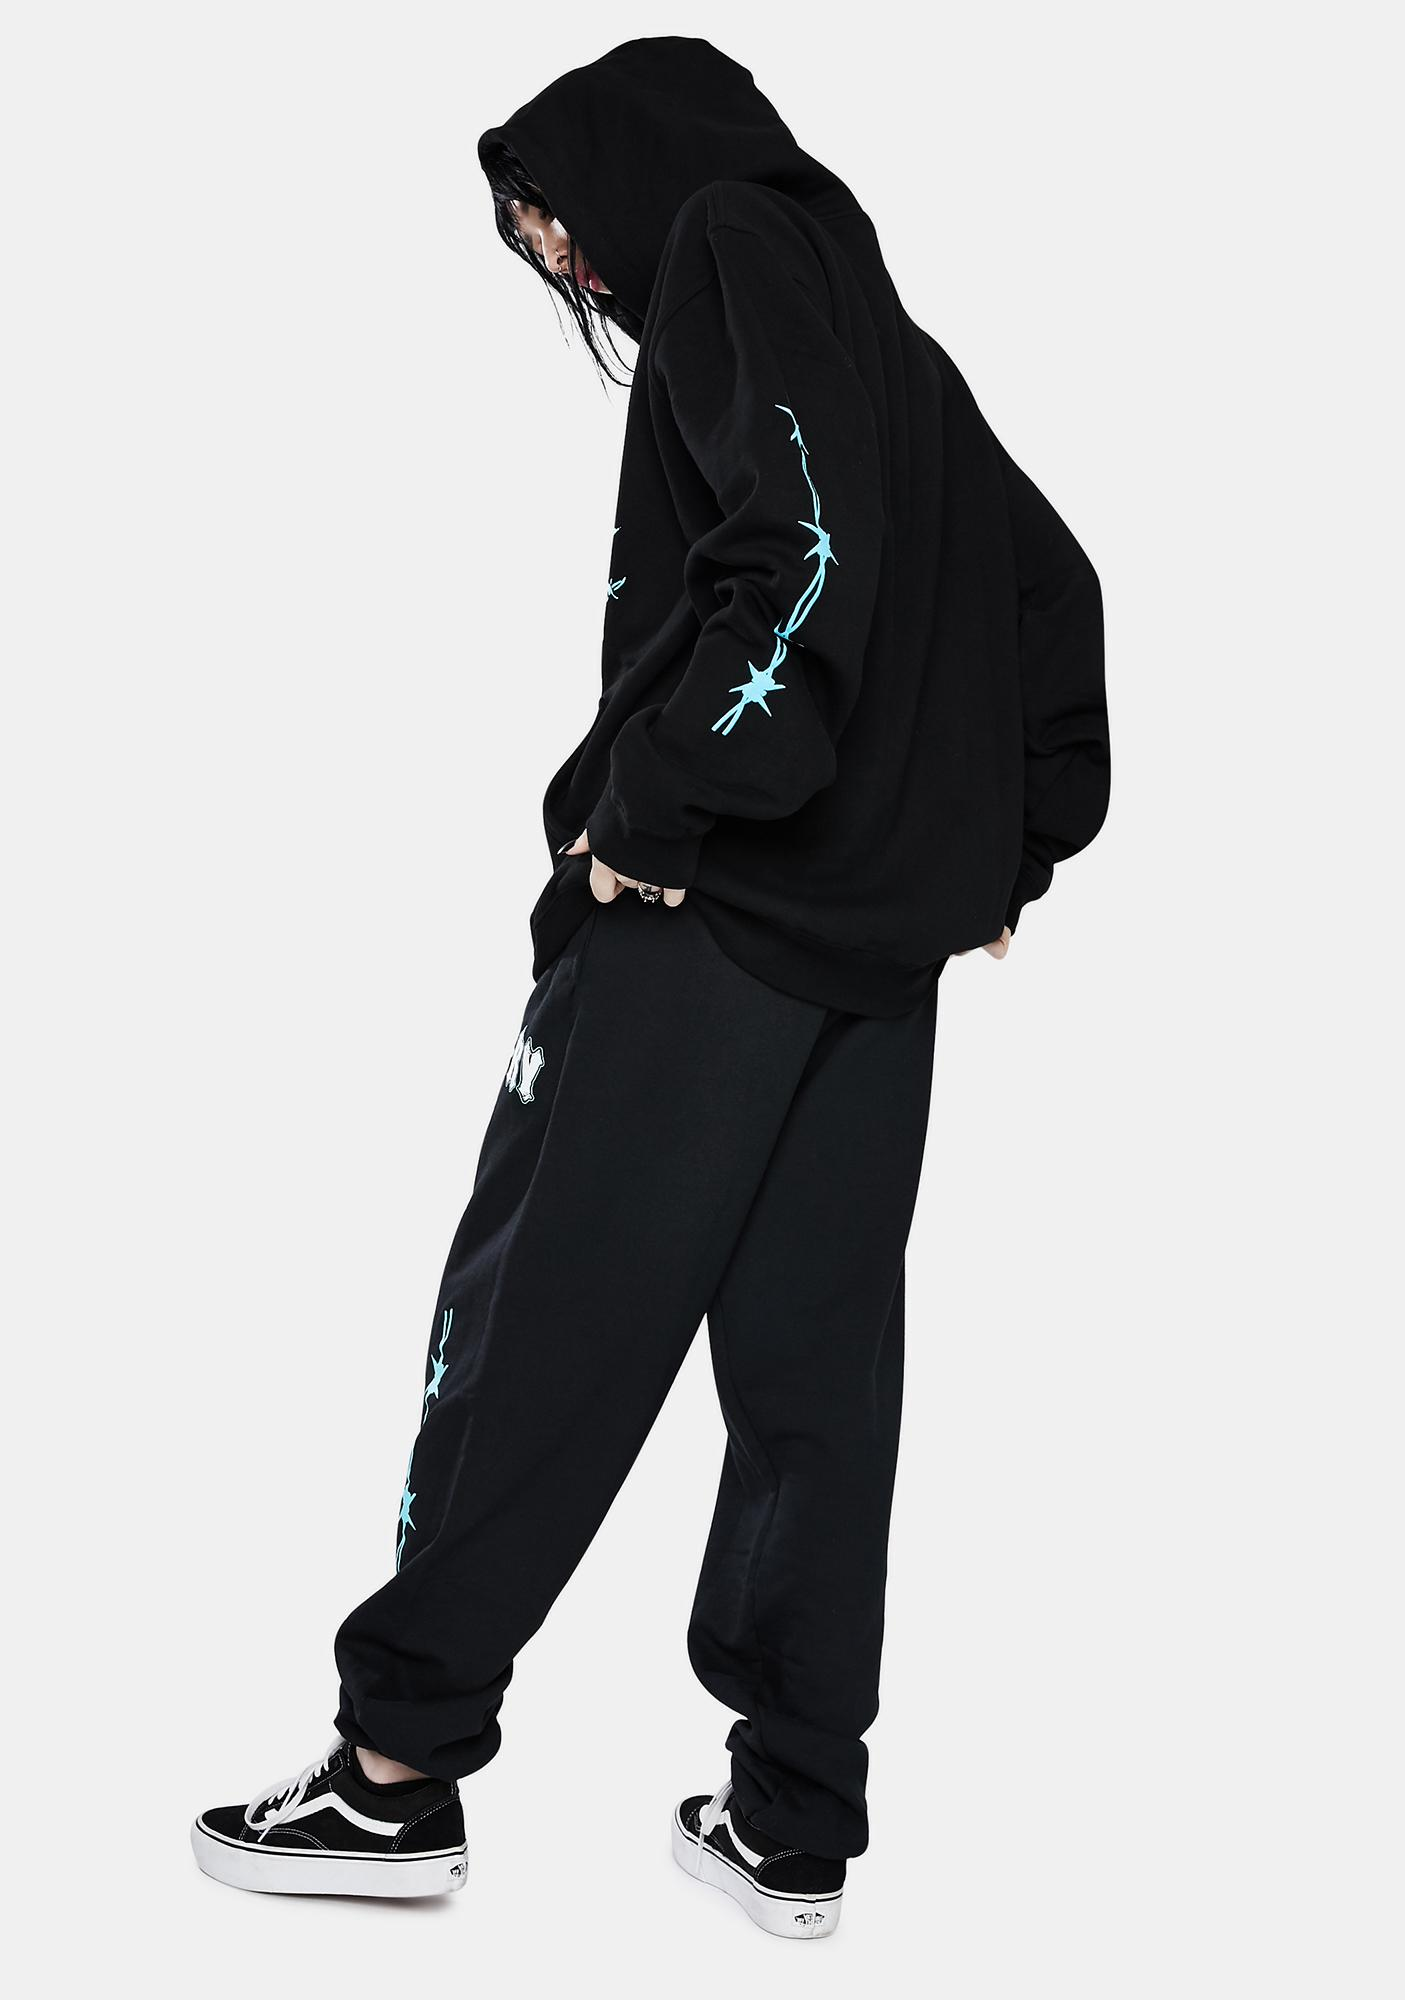 Misery Worldwide Black N Blue Triple Rip Sweatpants